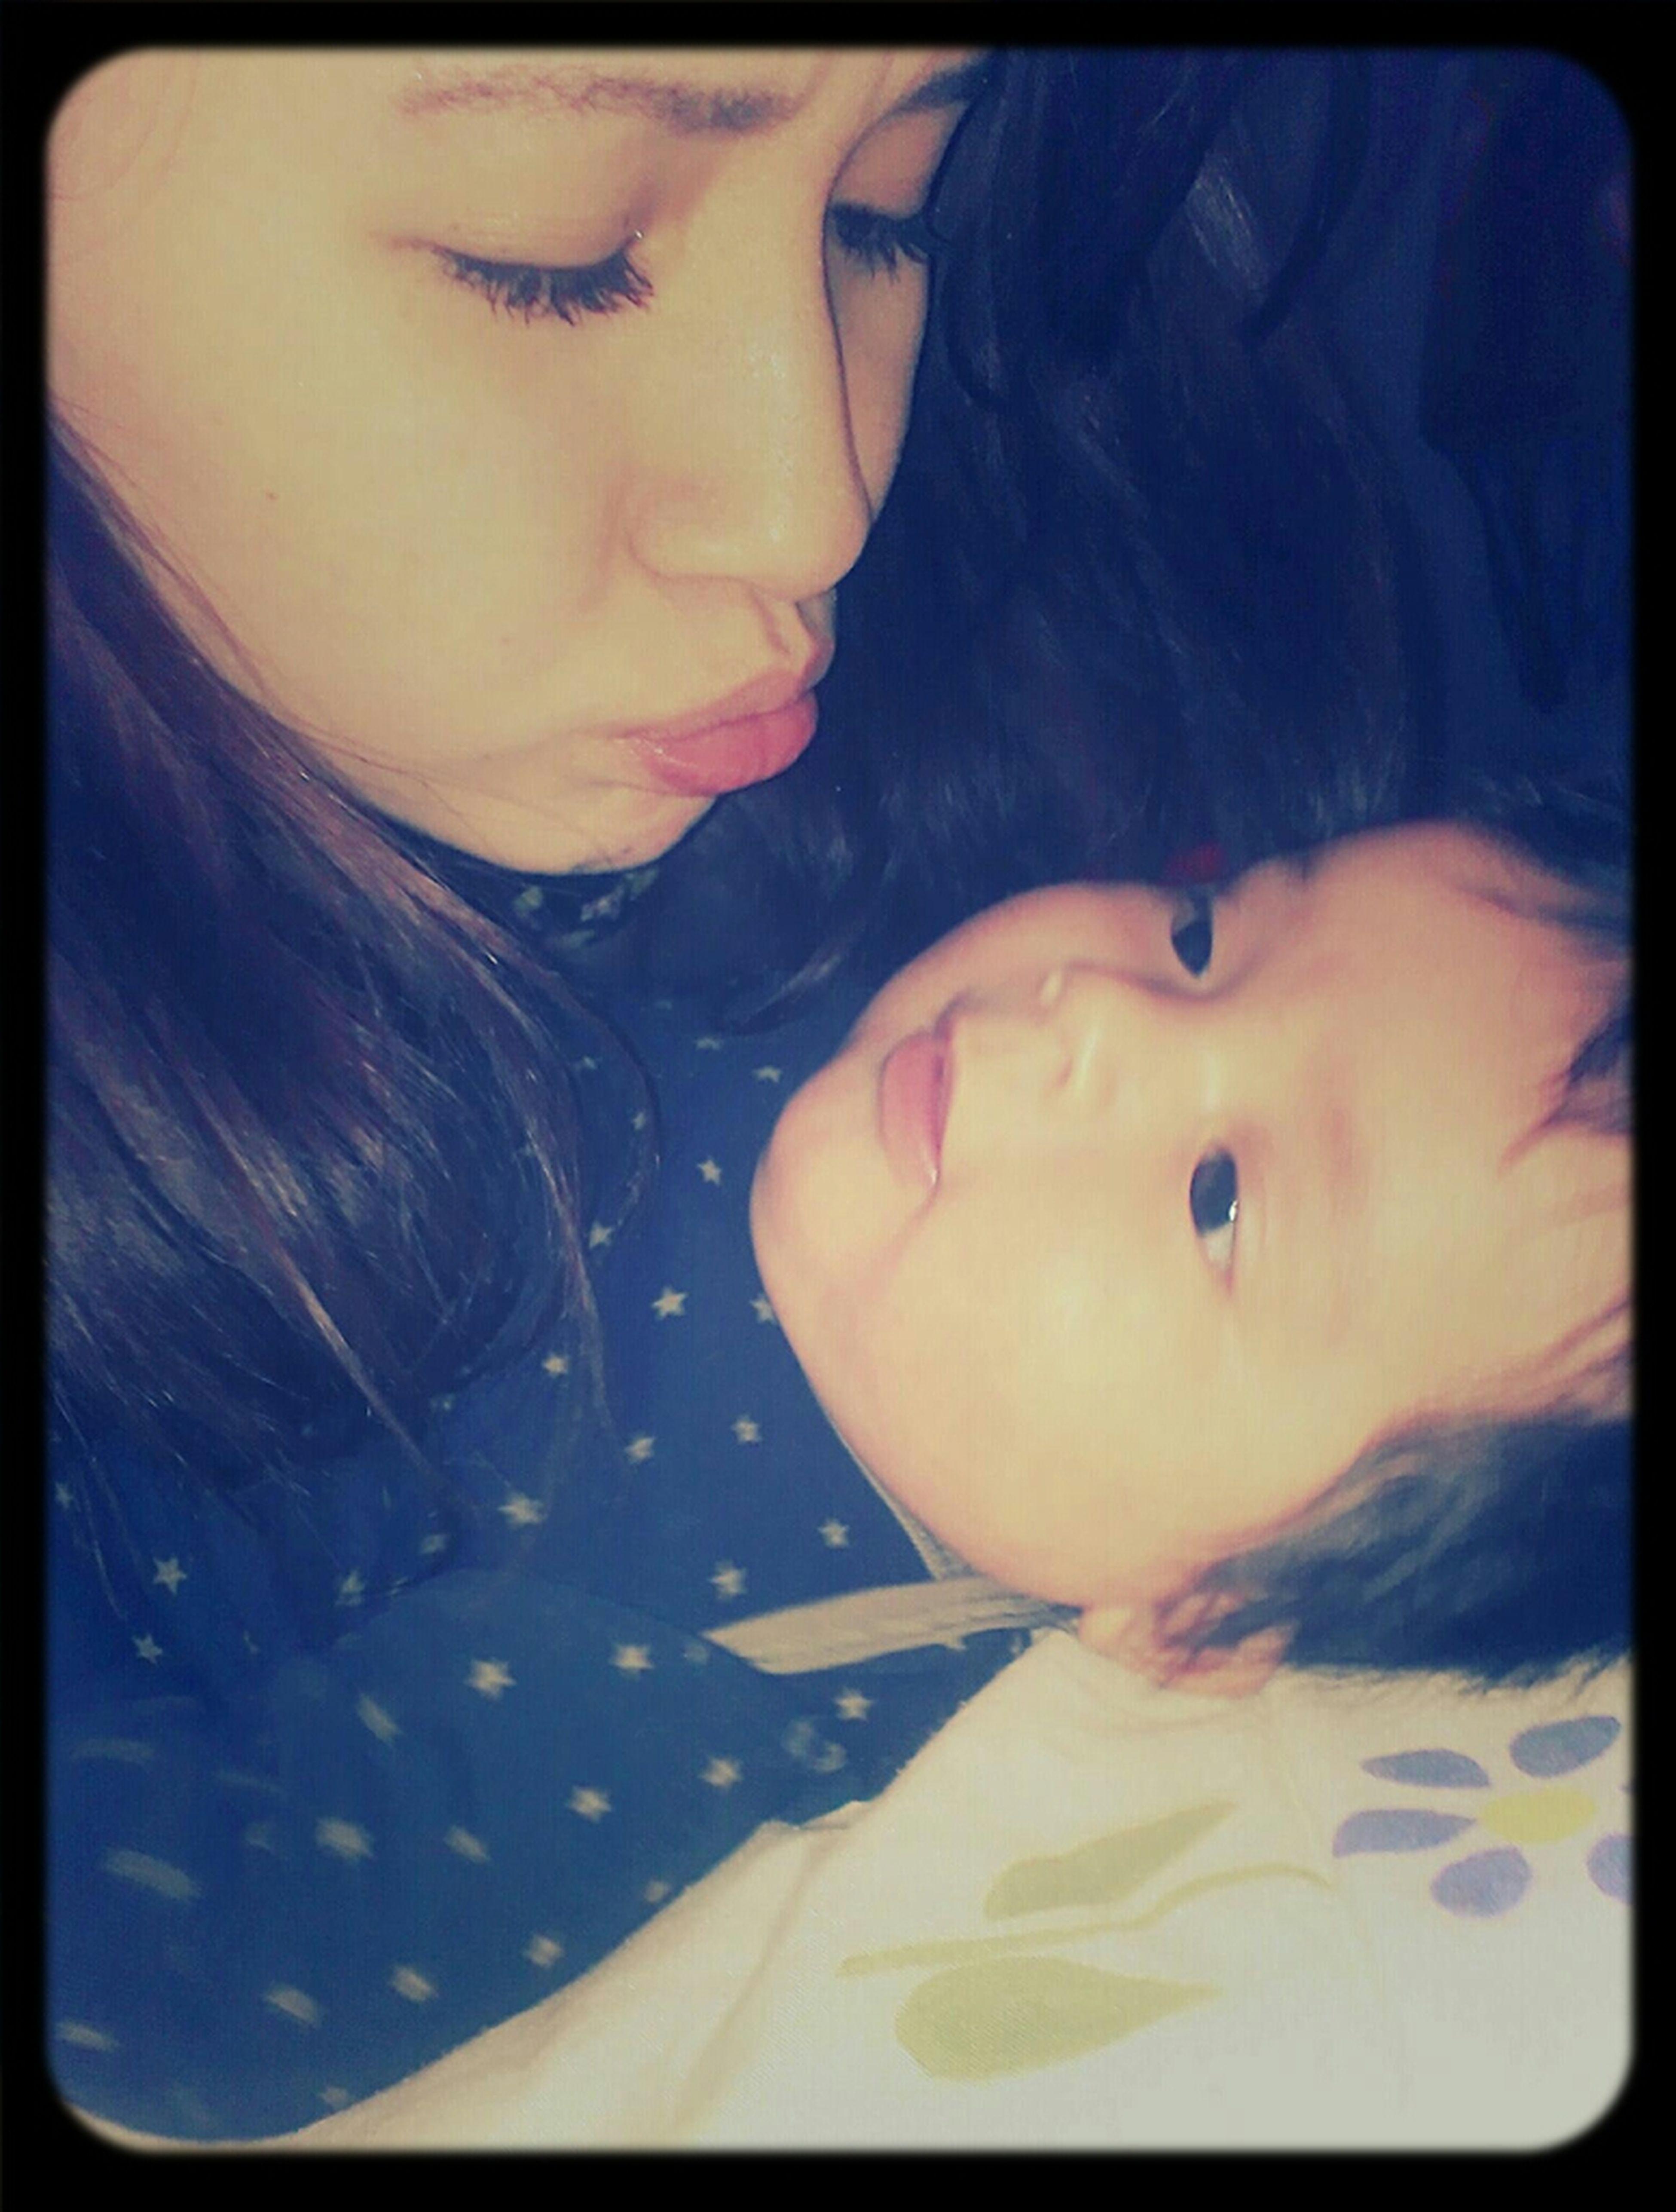 Me & My Nephew ^.^